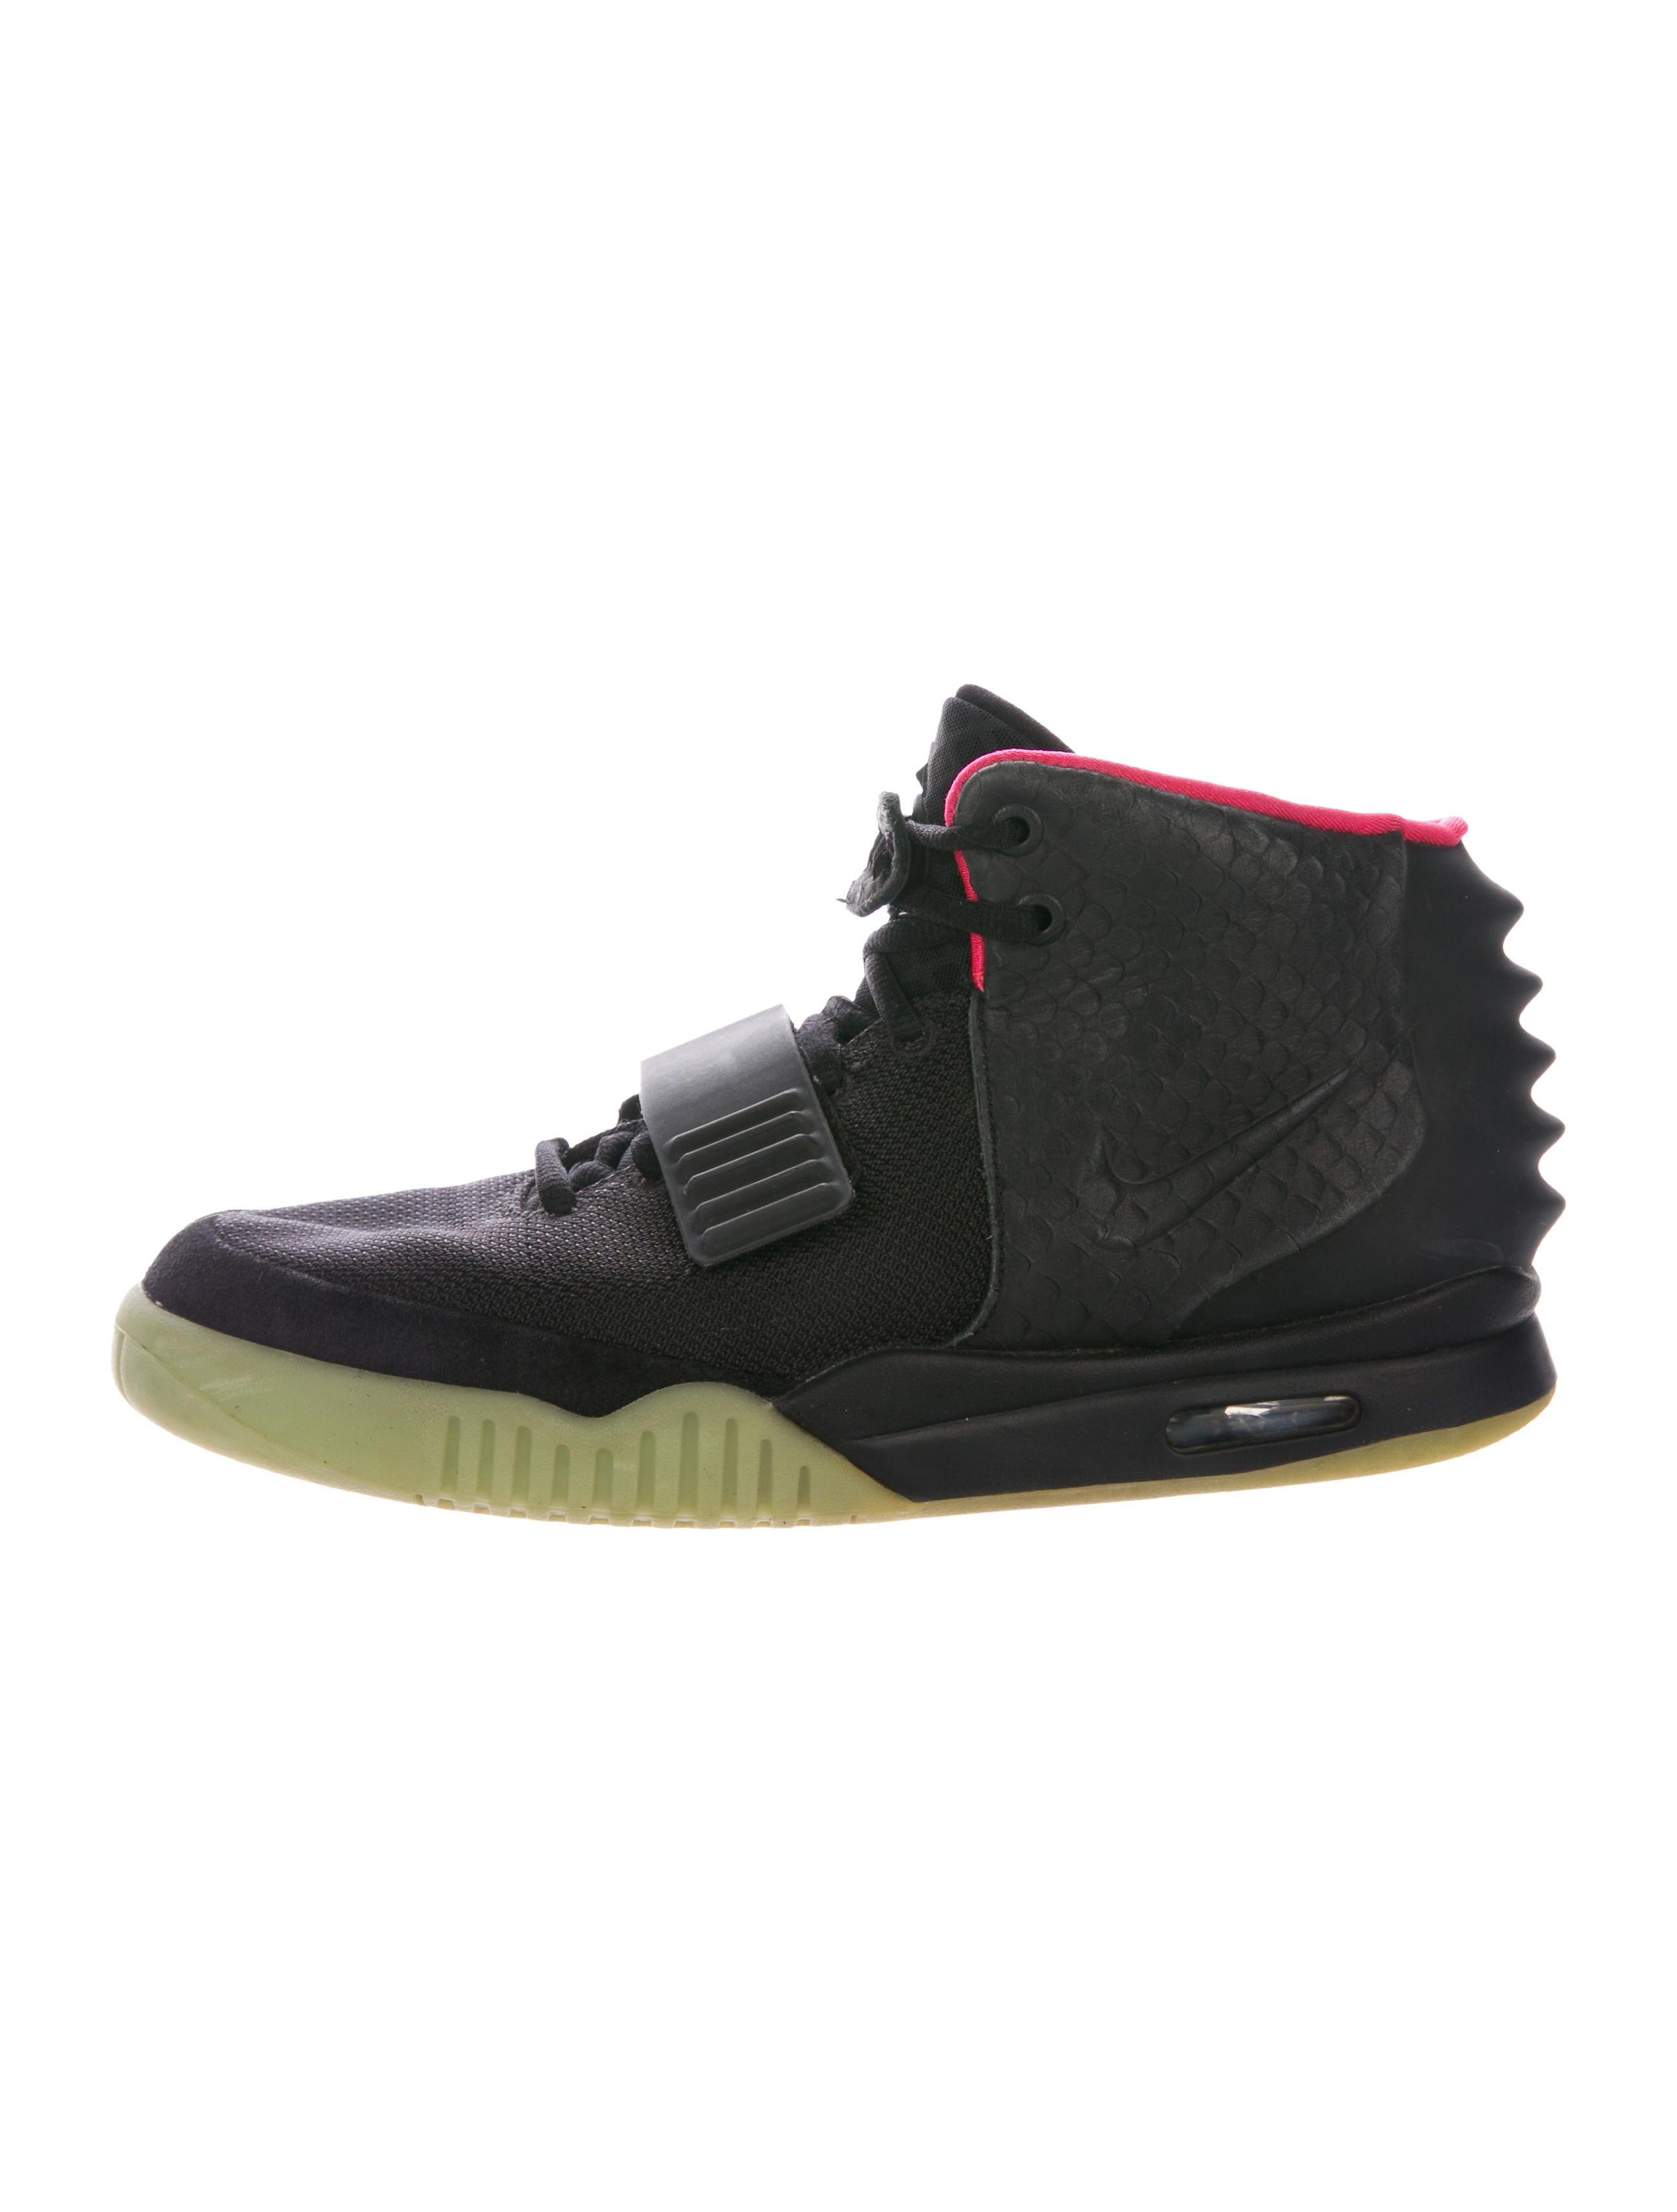 Nike x Kanye West Air Yeezy 2 NRG Solar